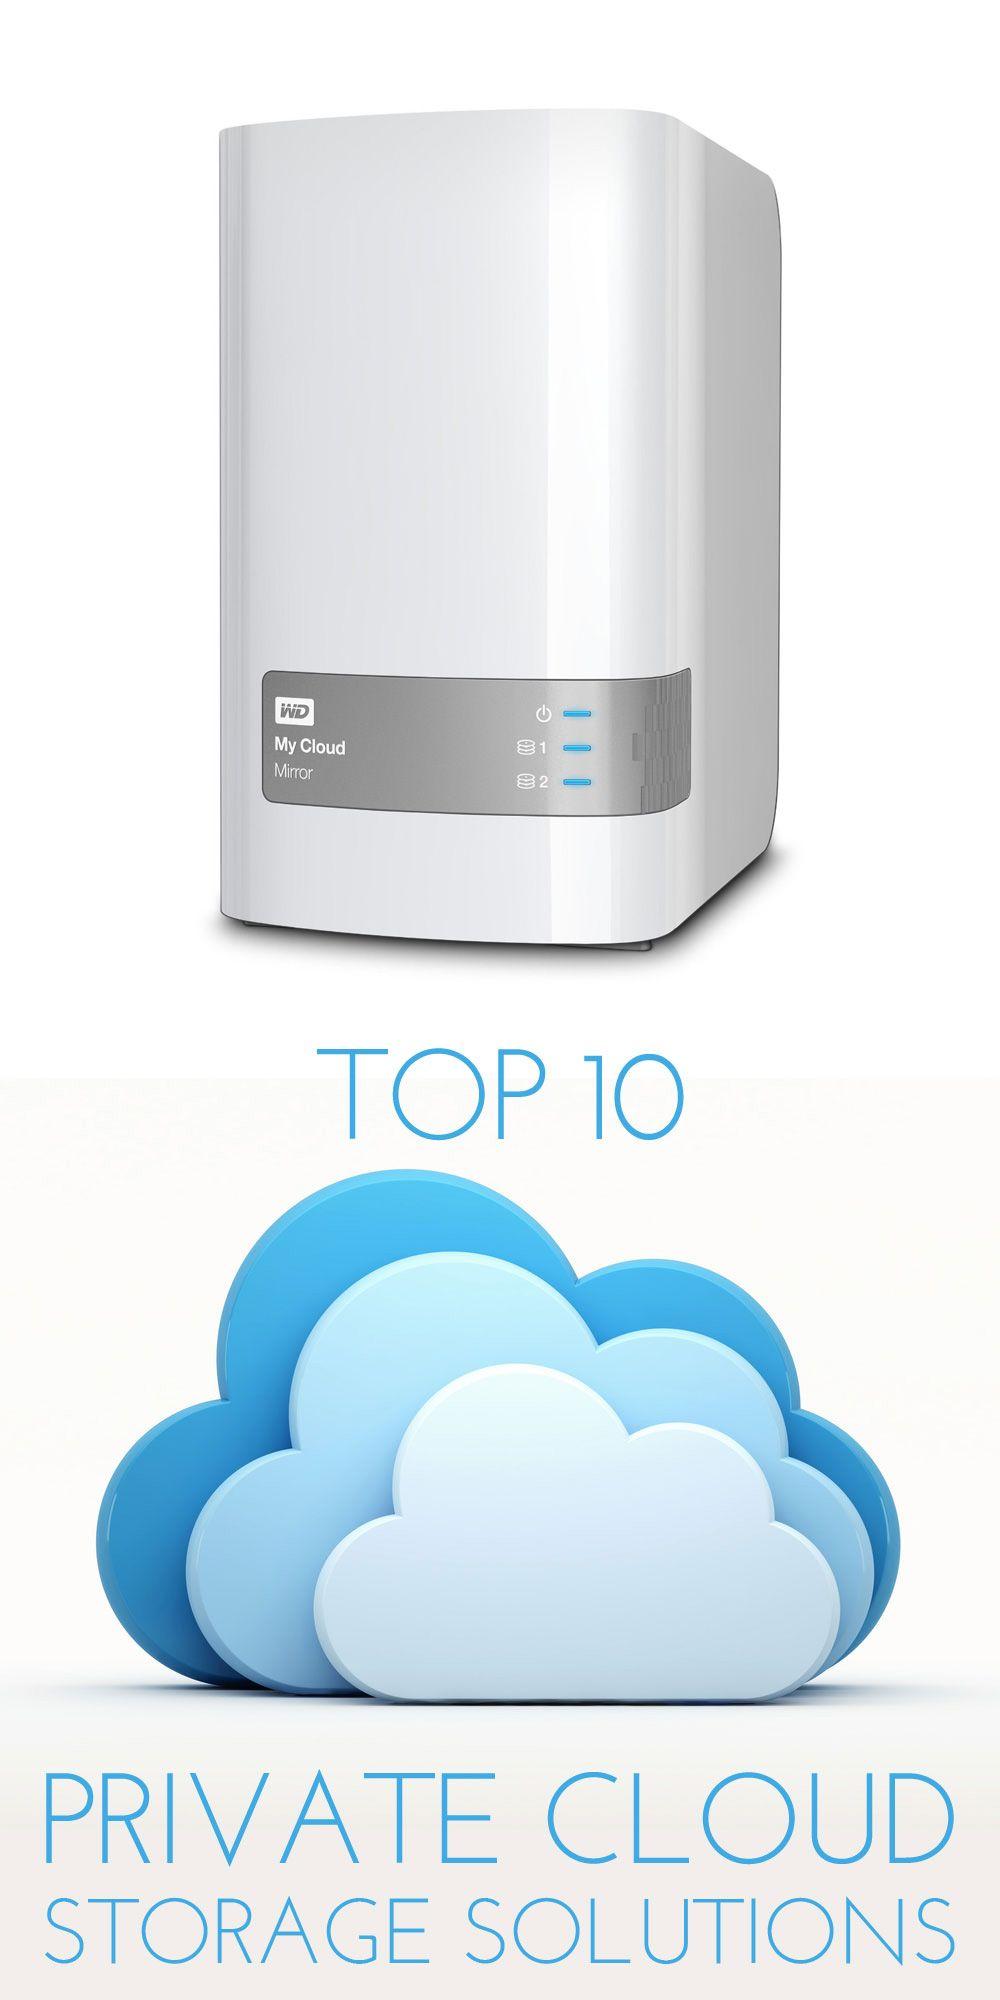 Top 10 Personal Cloud Storage Solutions Storage Solutions Cloud Storage Clouds